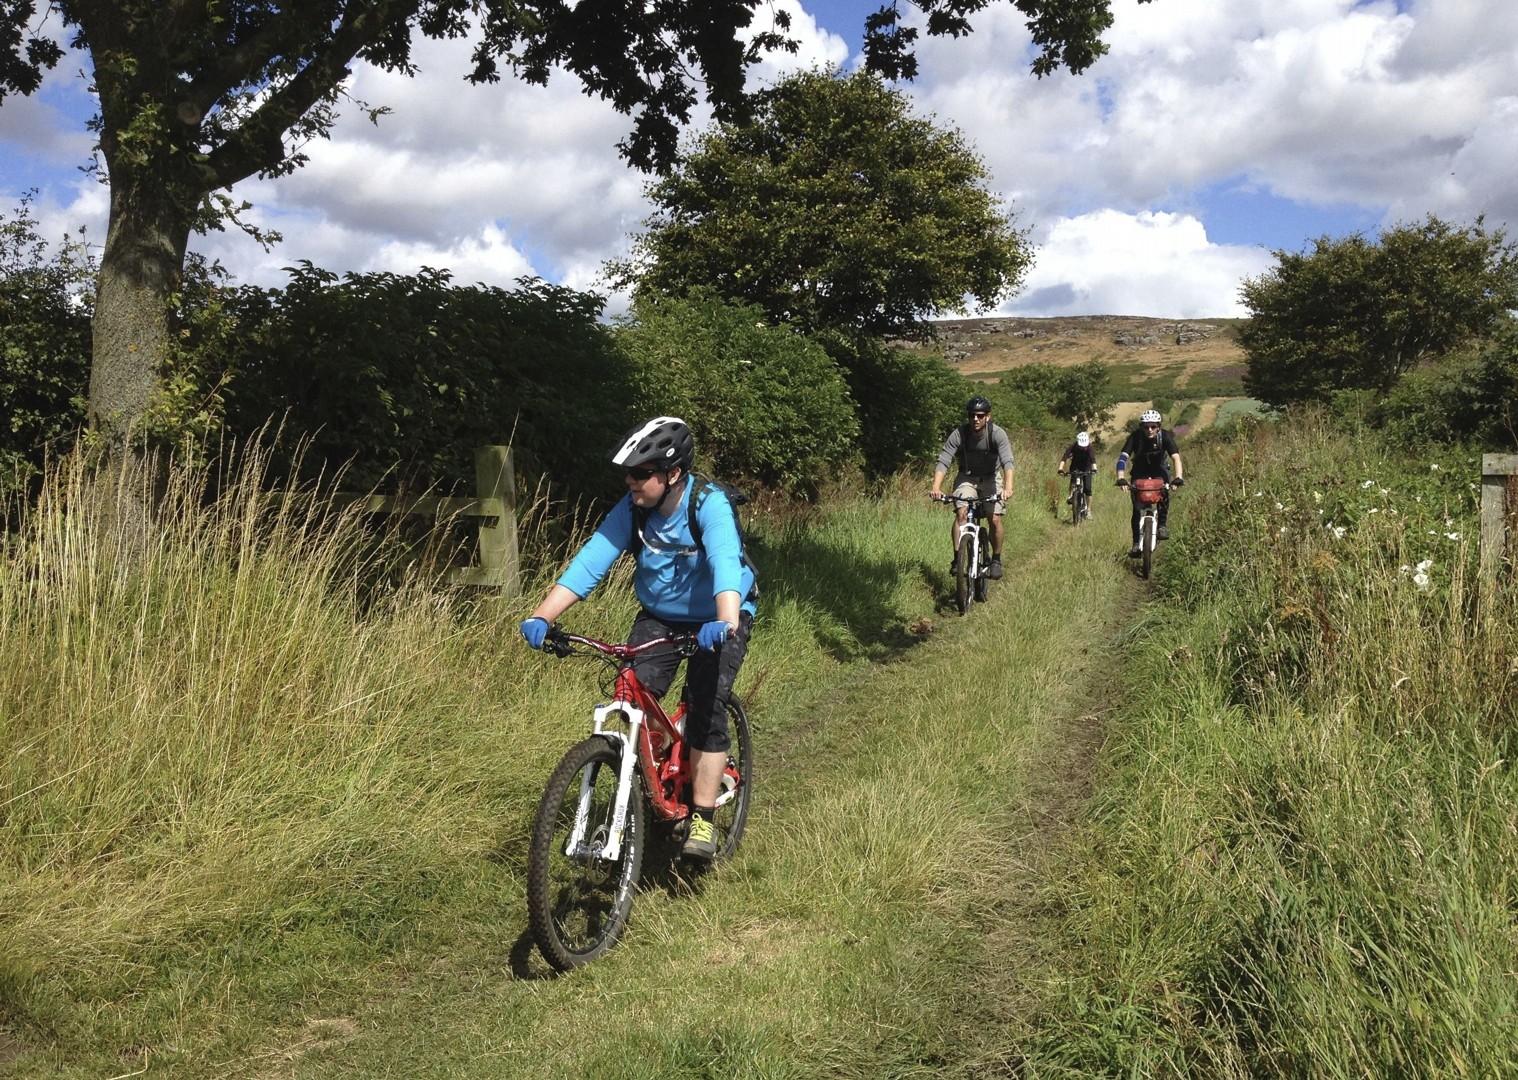 Sandstoneway5.jpg - UK - Northumberland - Sandstone Way - Mountain Biking